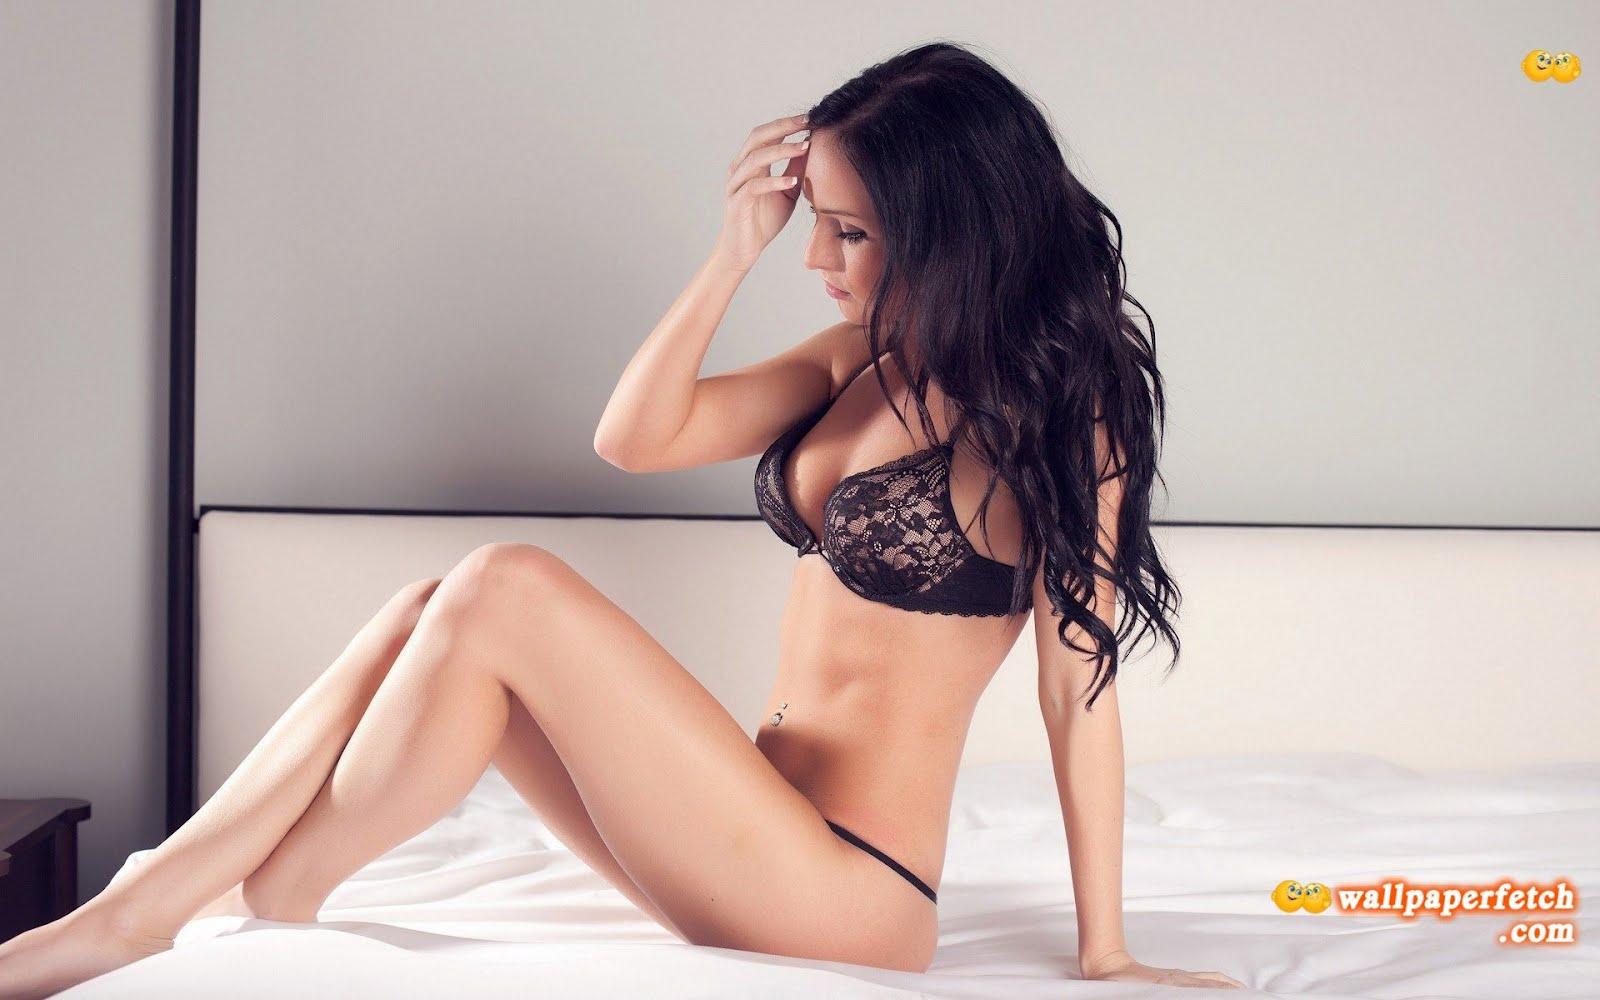 http://1.bp.blogspot.com/-9HVbKPlq_Pc/UC6e2UVTnkI/AAAAAAAANhM/mK4En1wkePk/s1600/lingerie-girl-211140.jpg